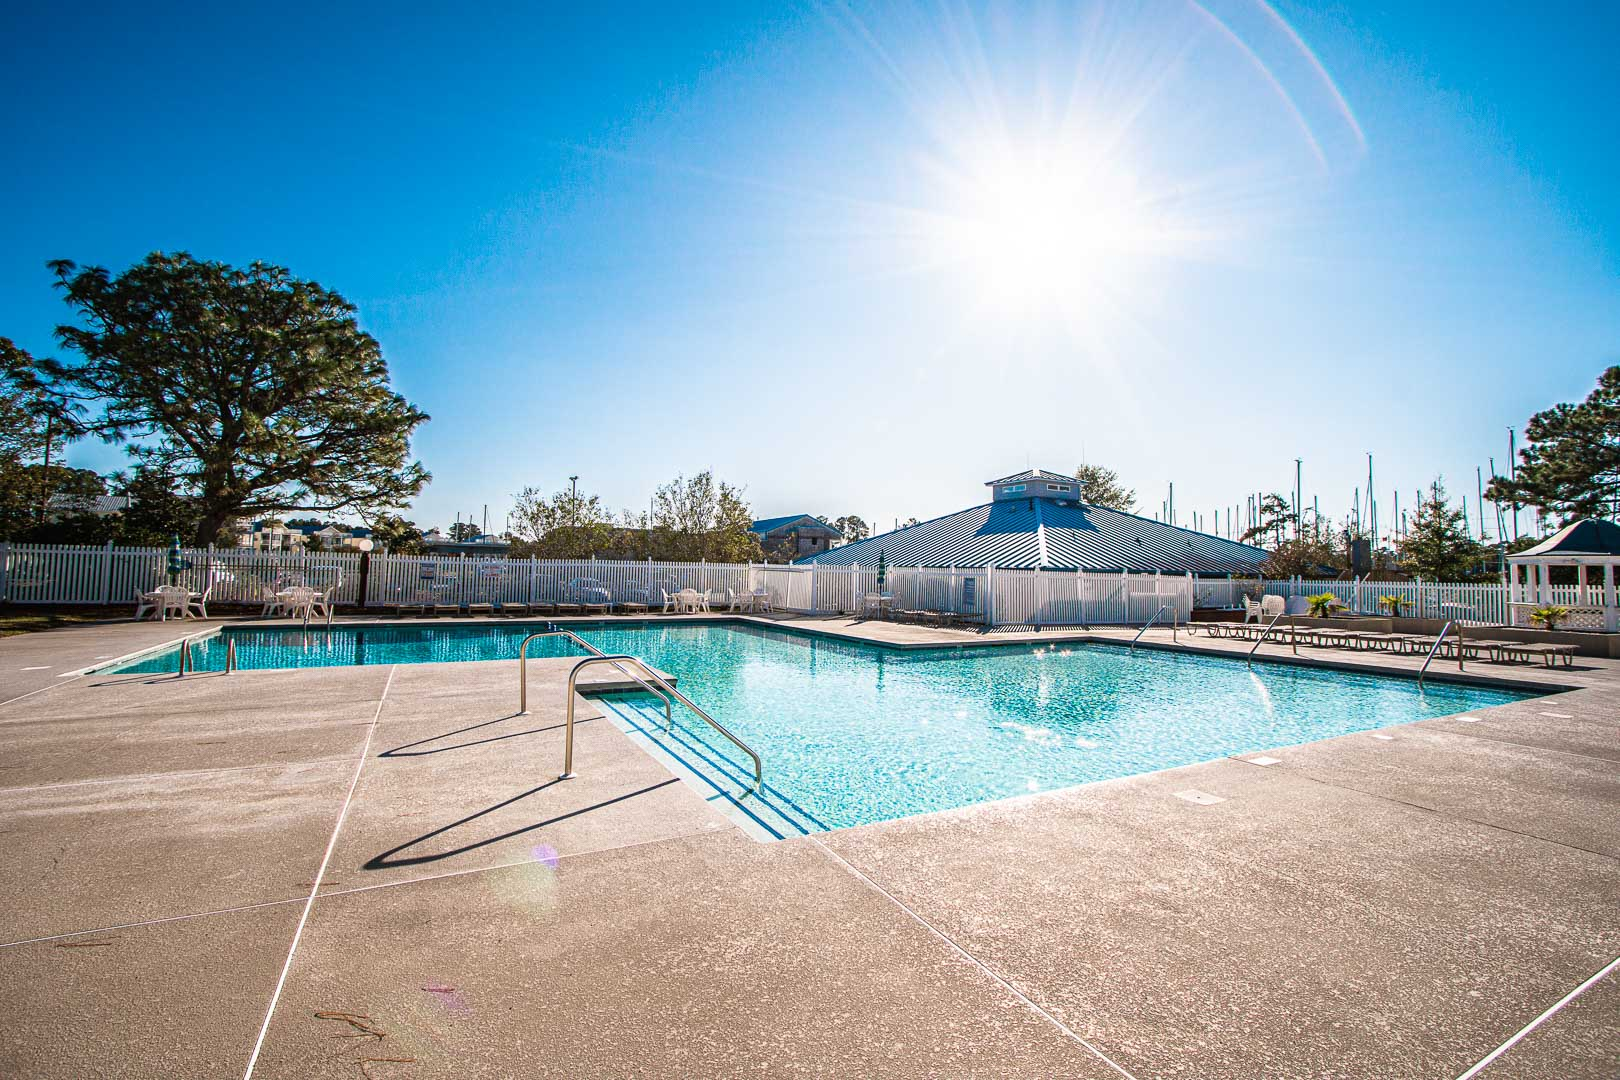 A crisp swimming pool at VRI's Sandcastle Cove in New Bern, North Carolina.